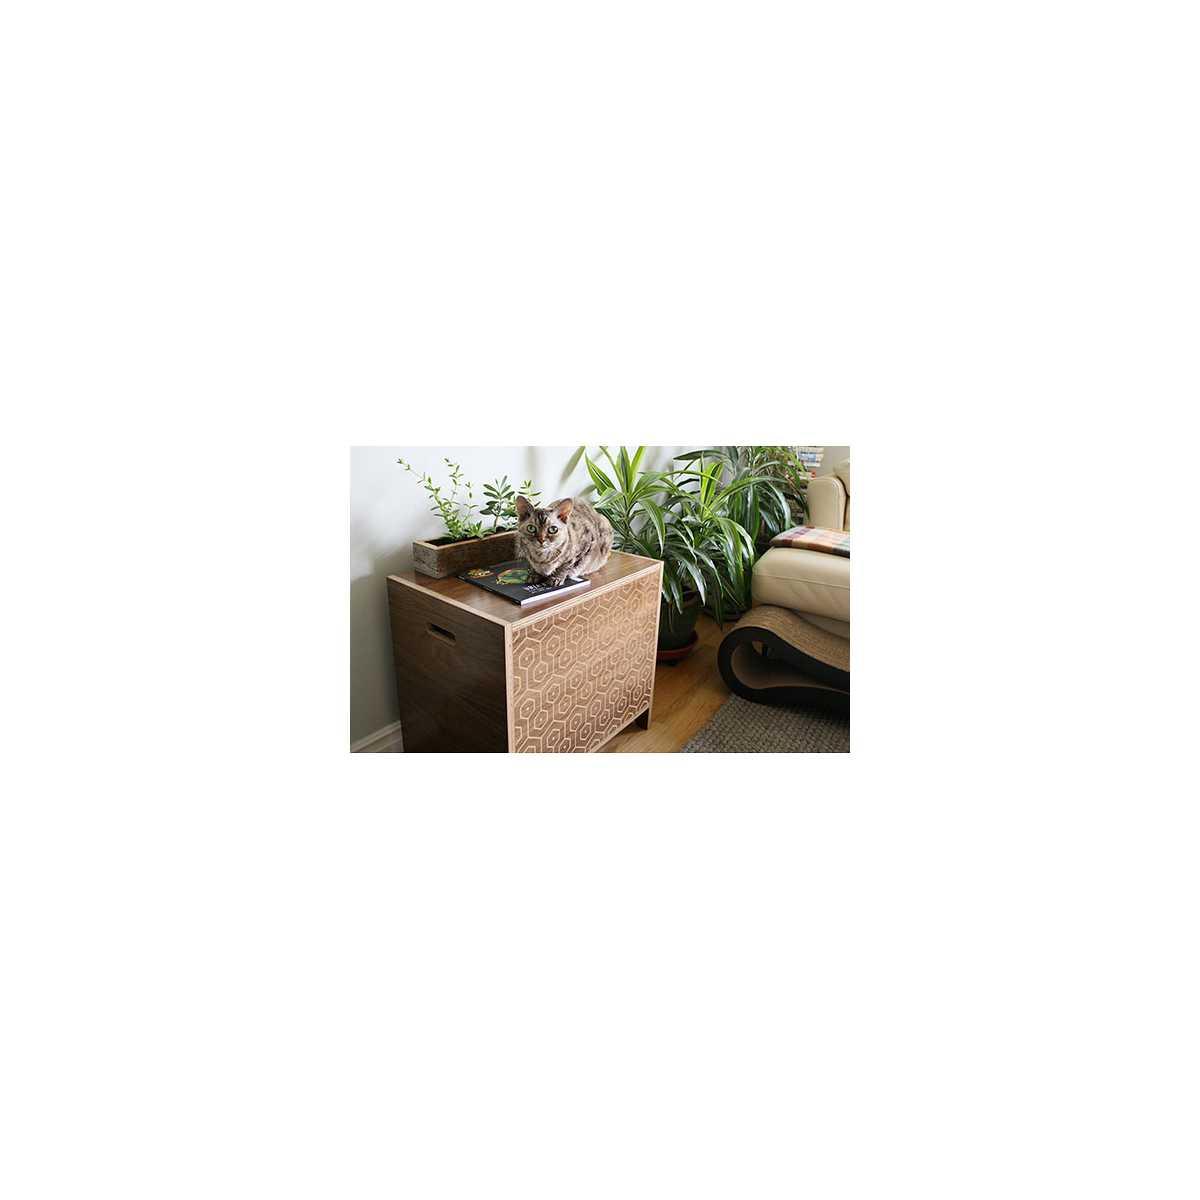 Curio Modern Cat Litter Box Or Pet House Walnut Pattern